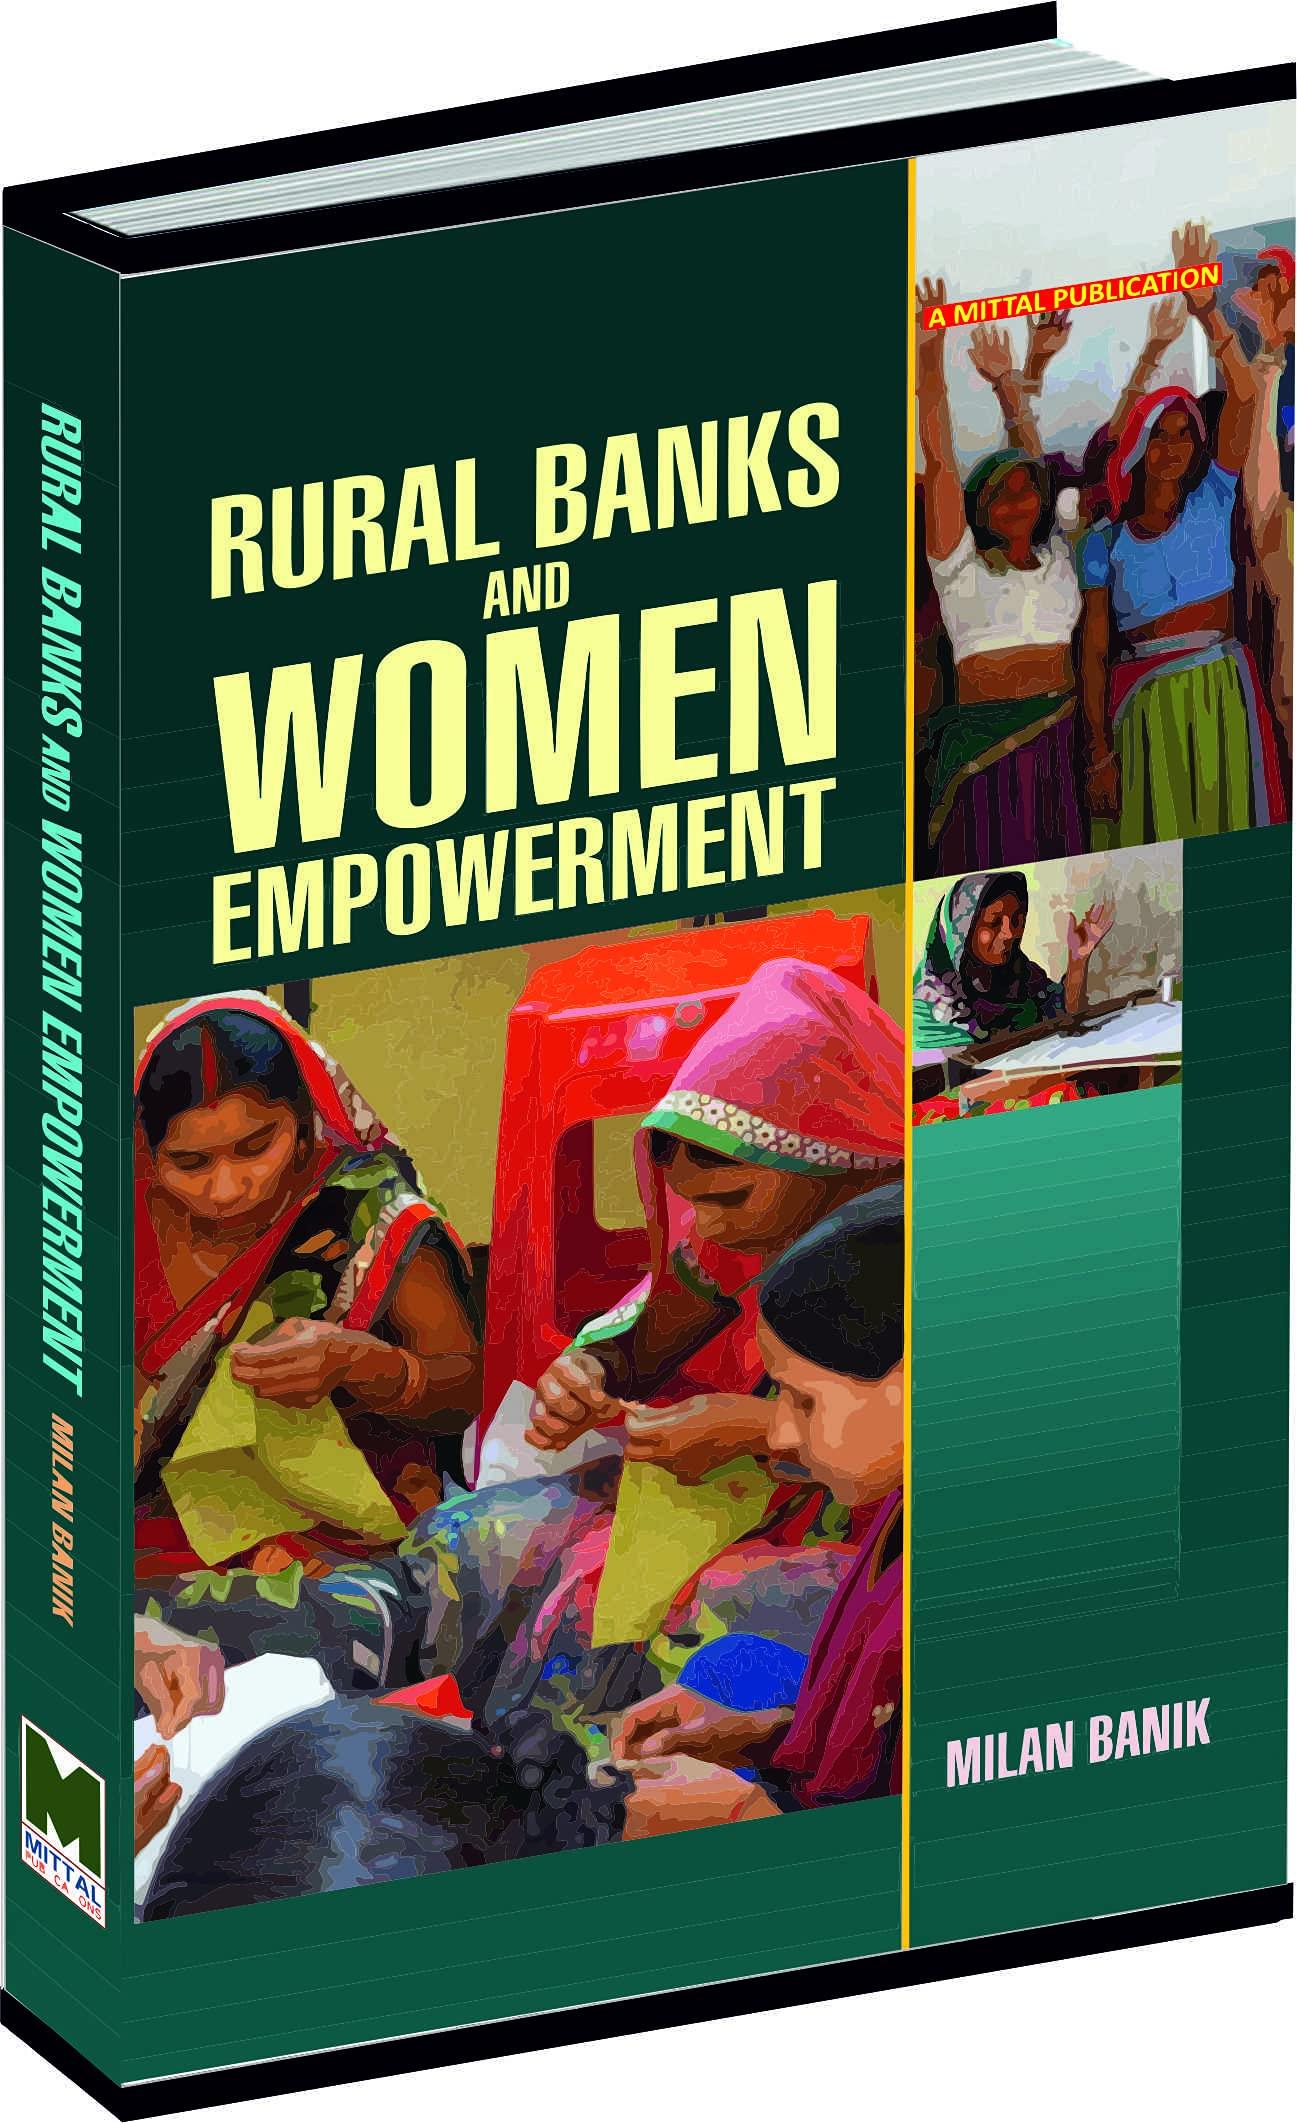 Rural Banks and Women Empowerment